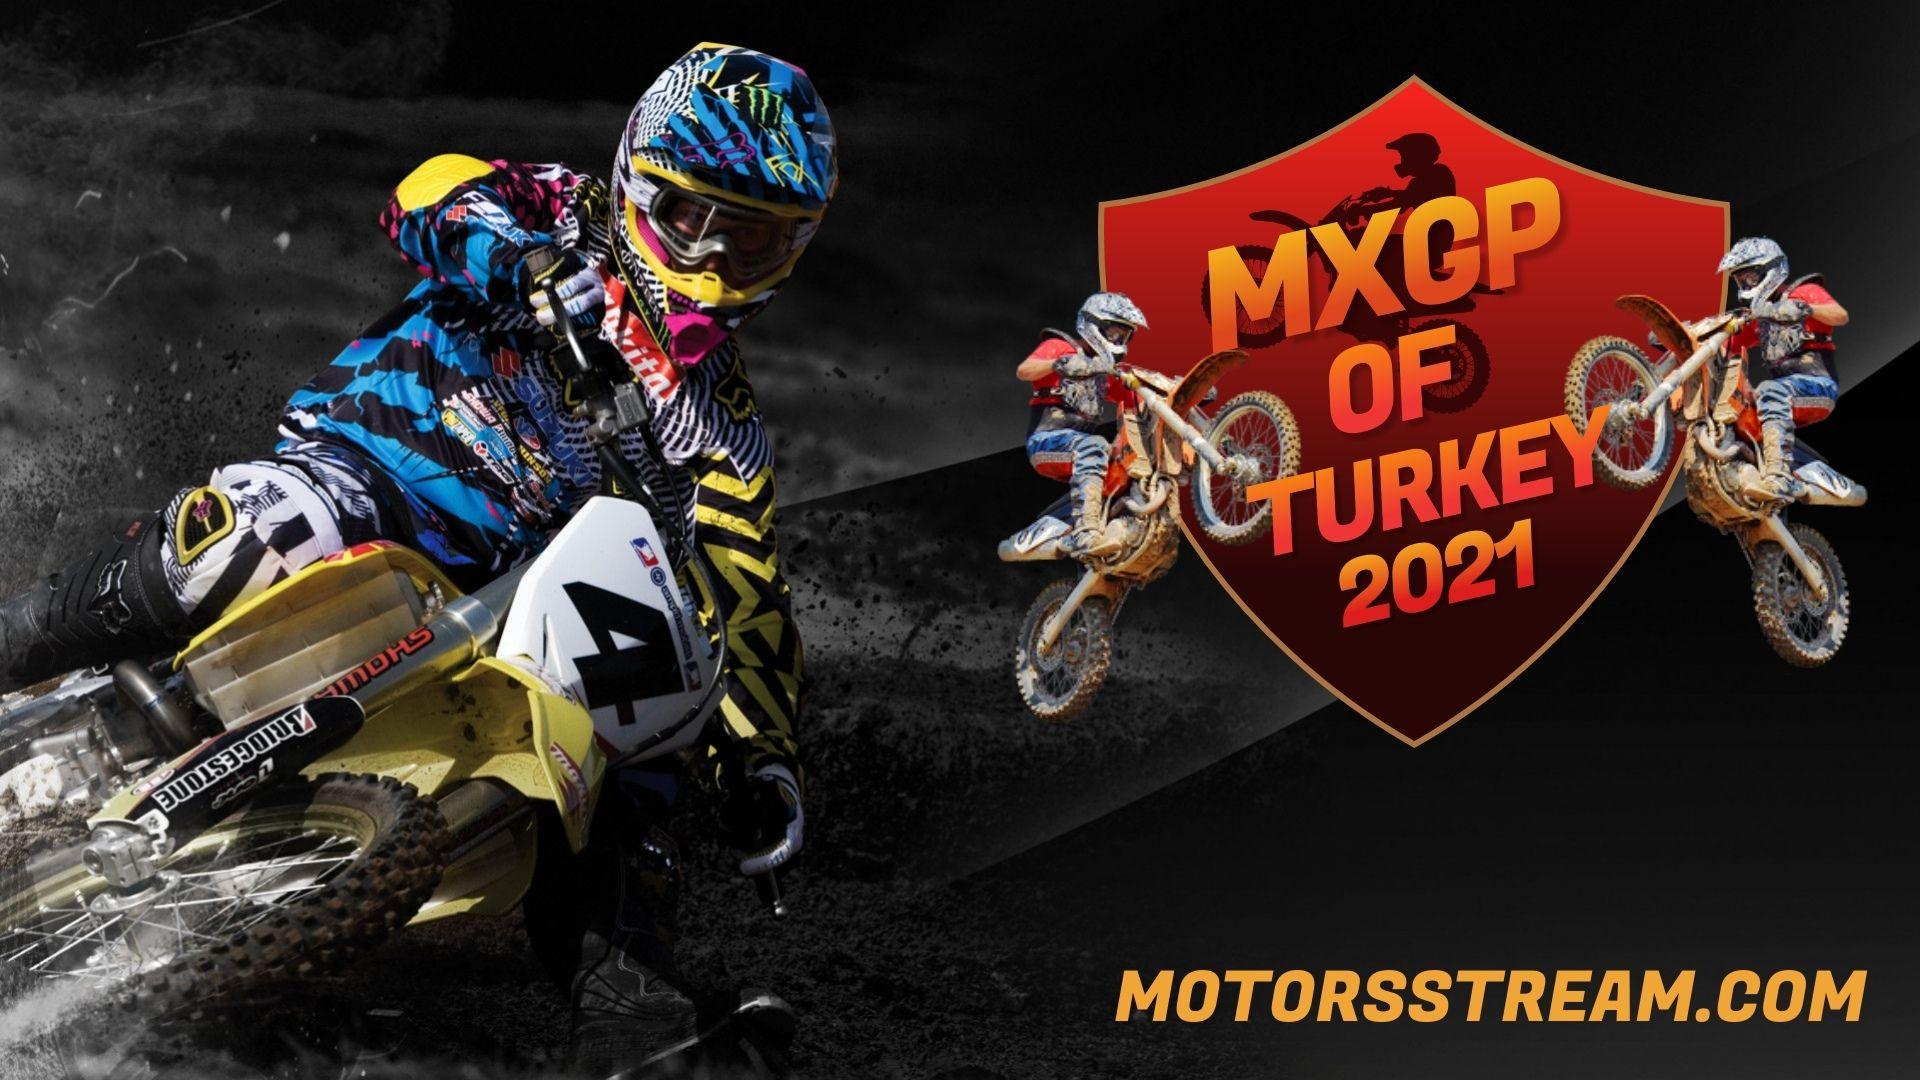 FIM Motocross WC Turkey Live Stream 2021 | MXGP